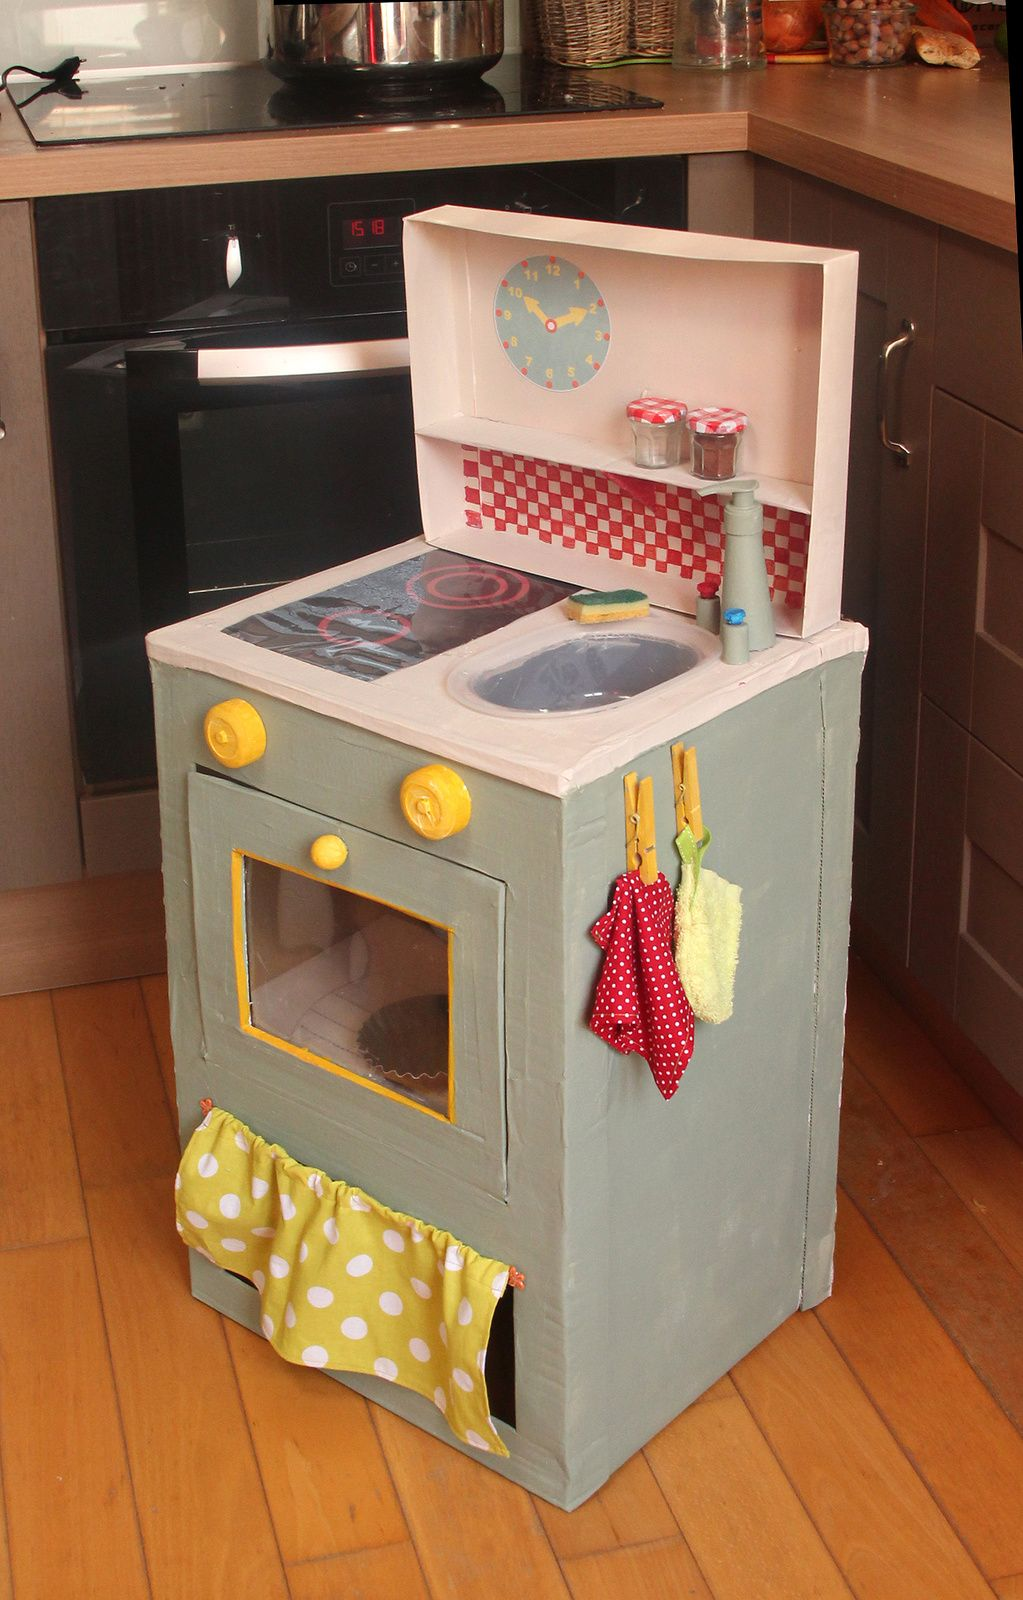 cuisine en carton pour enfants cardboard children. Black Bedroom Furniture Sets. Home Design Ideas